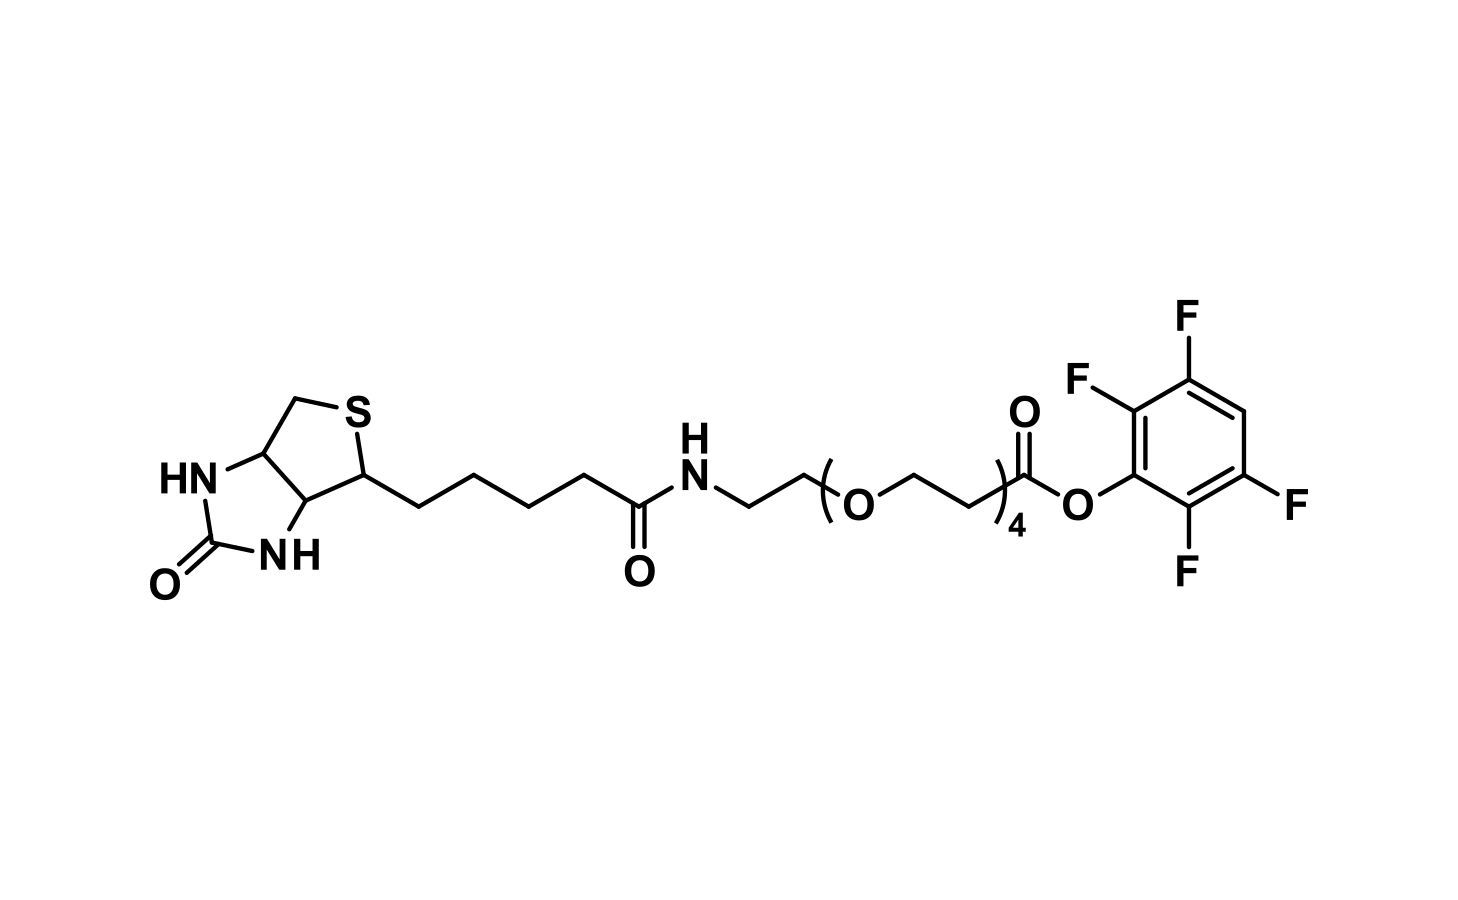 Biotin-dPEG®₄-TFP ester